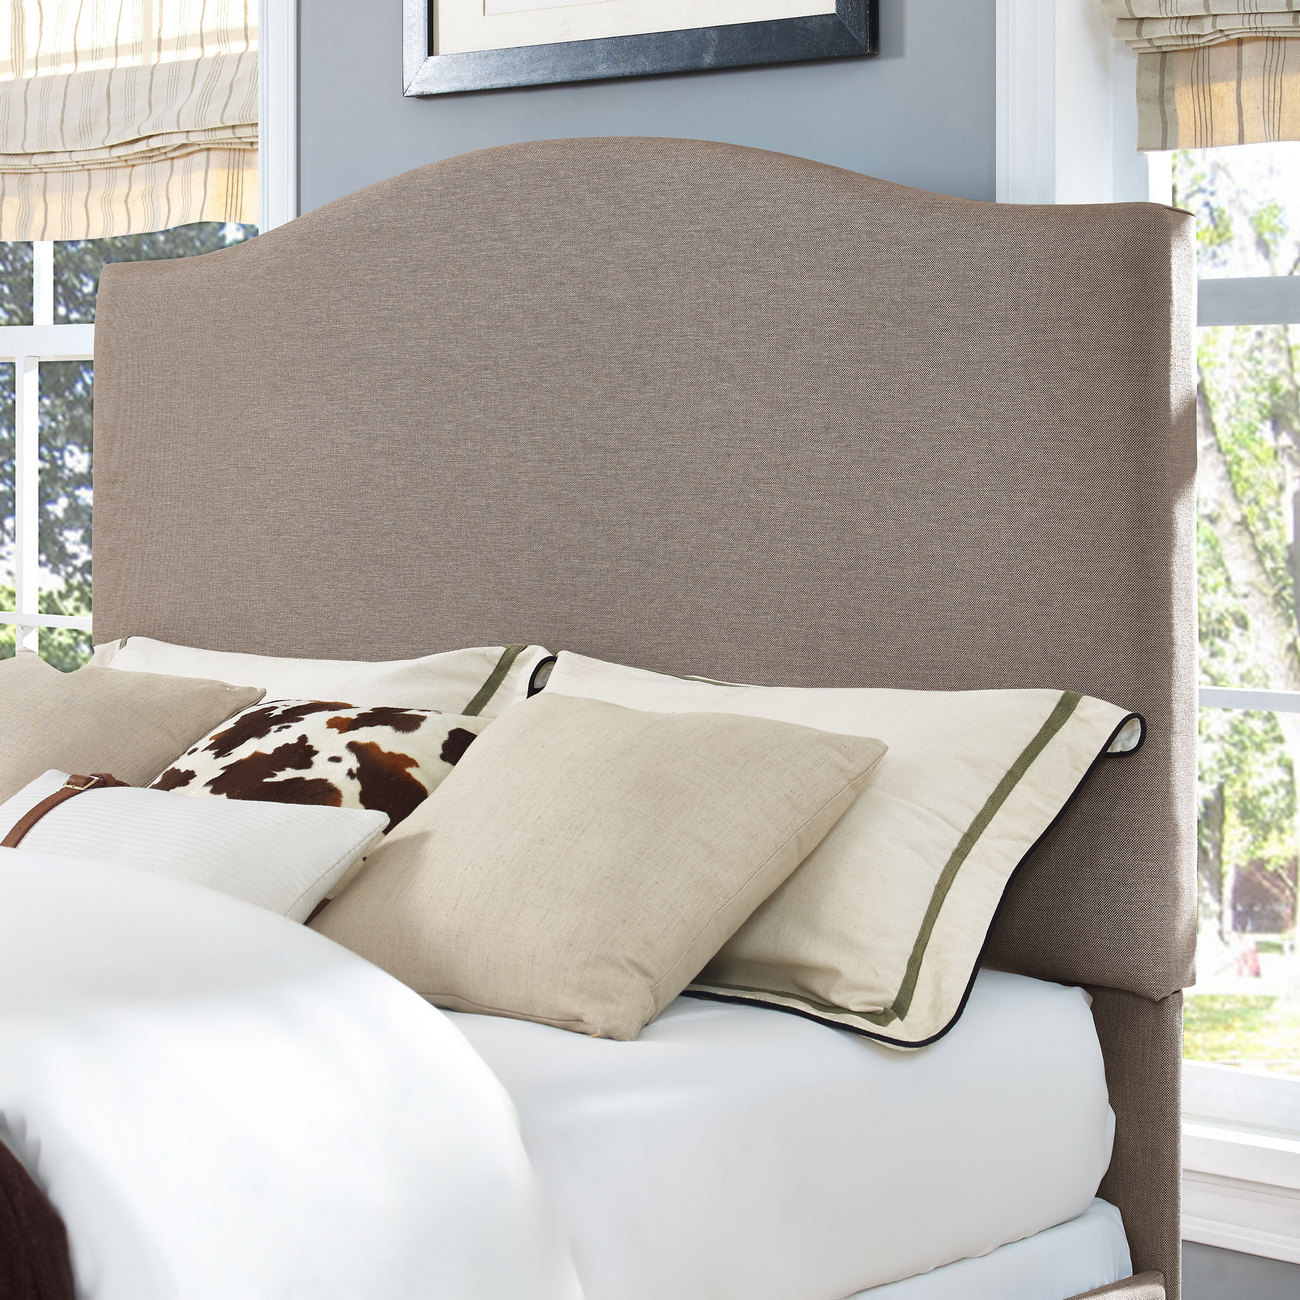 Bellingham Camelback Upholstered Full/Queen Headboard in Oatmeal Linen - Crosley CF90004-501OL